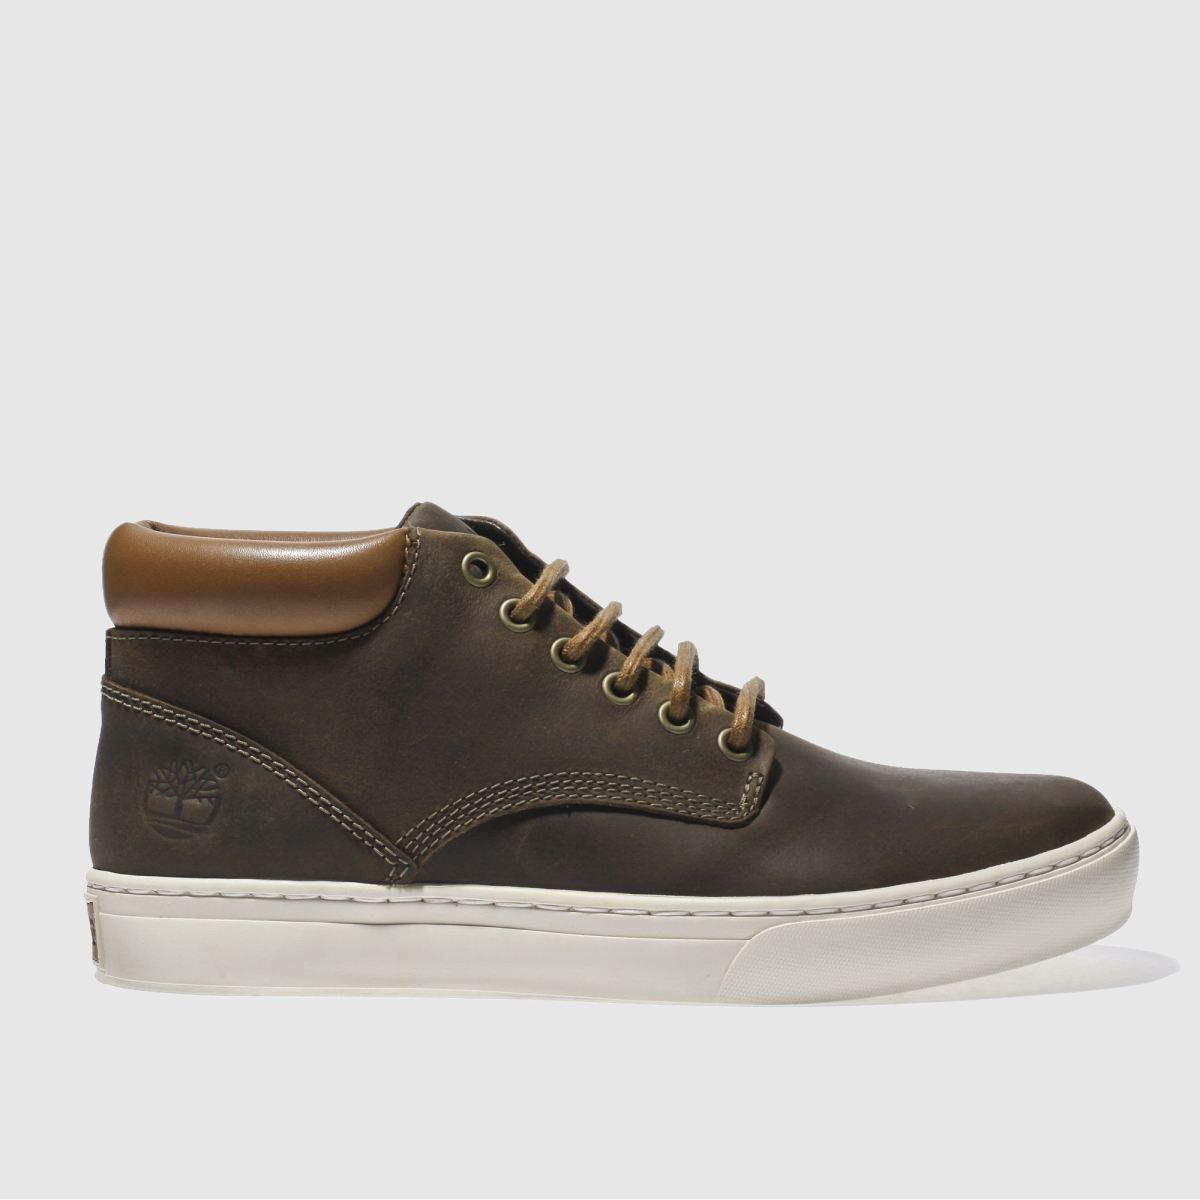 timberland dark olive timb 2.0 chukka boots